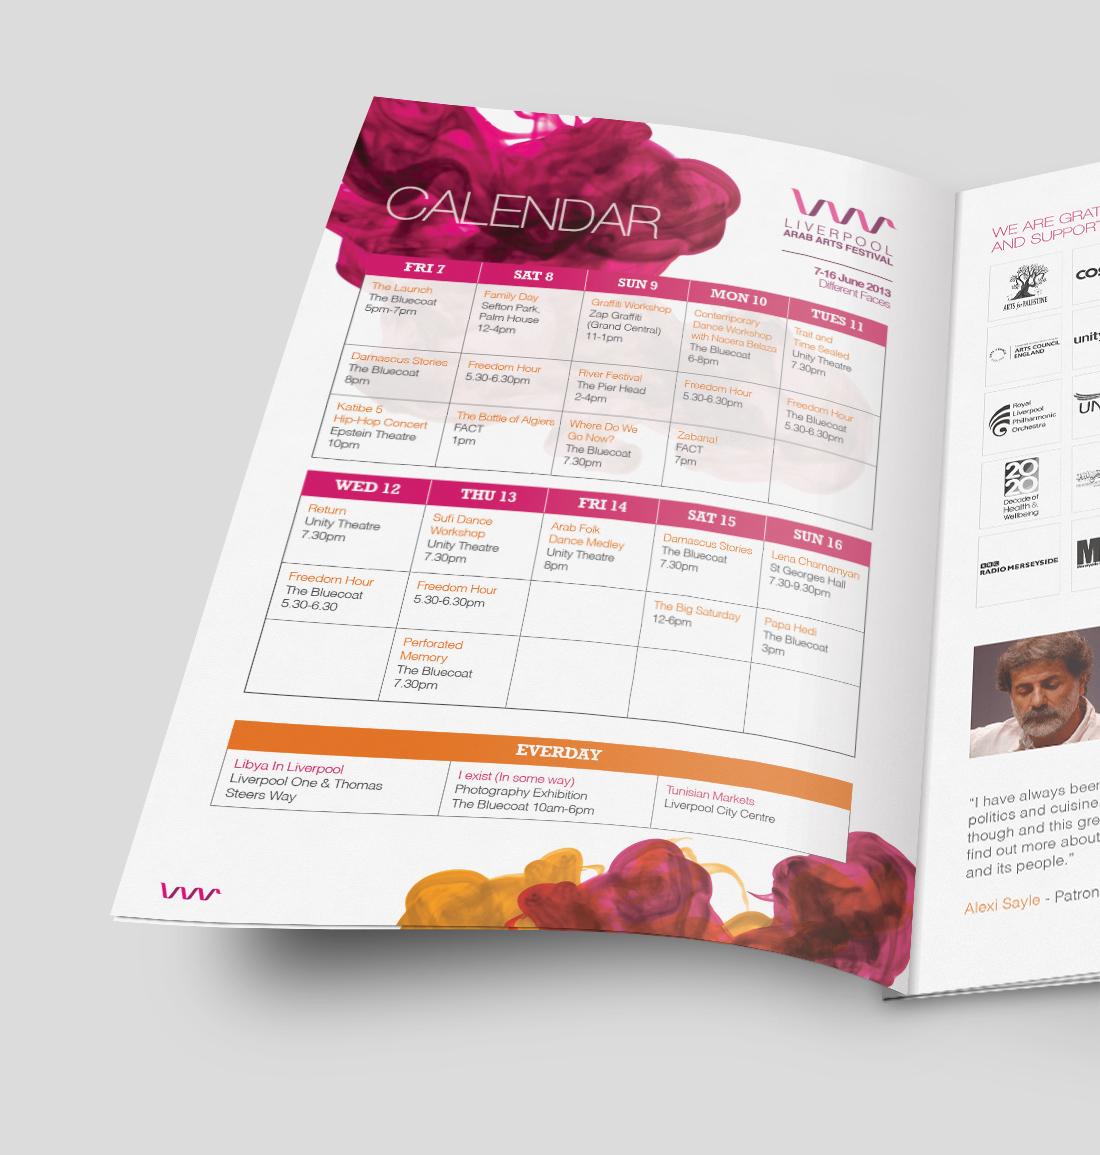 TinyBeastDesign-LiverpoolArabArtsFestival-Brochure-Calendar